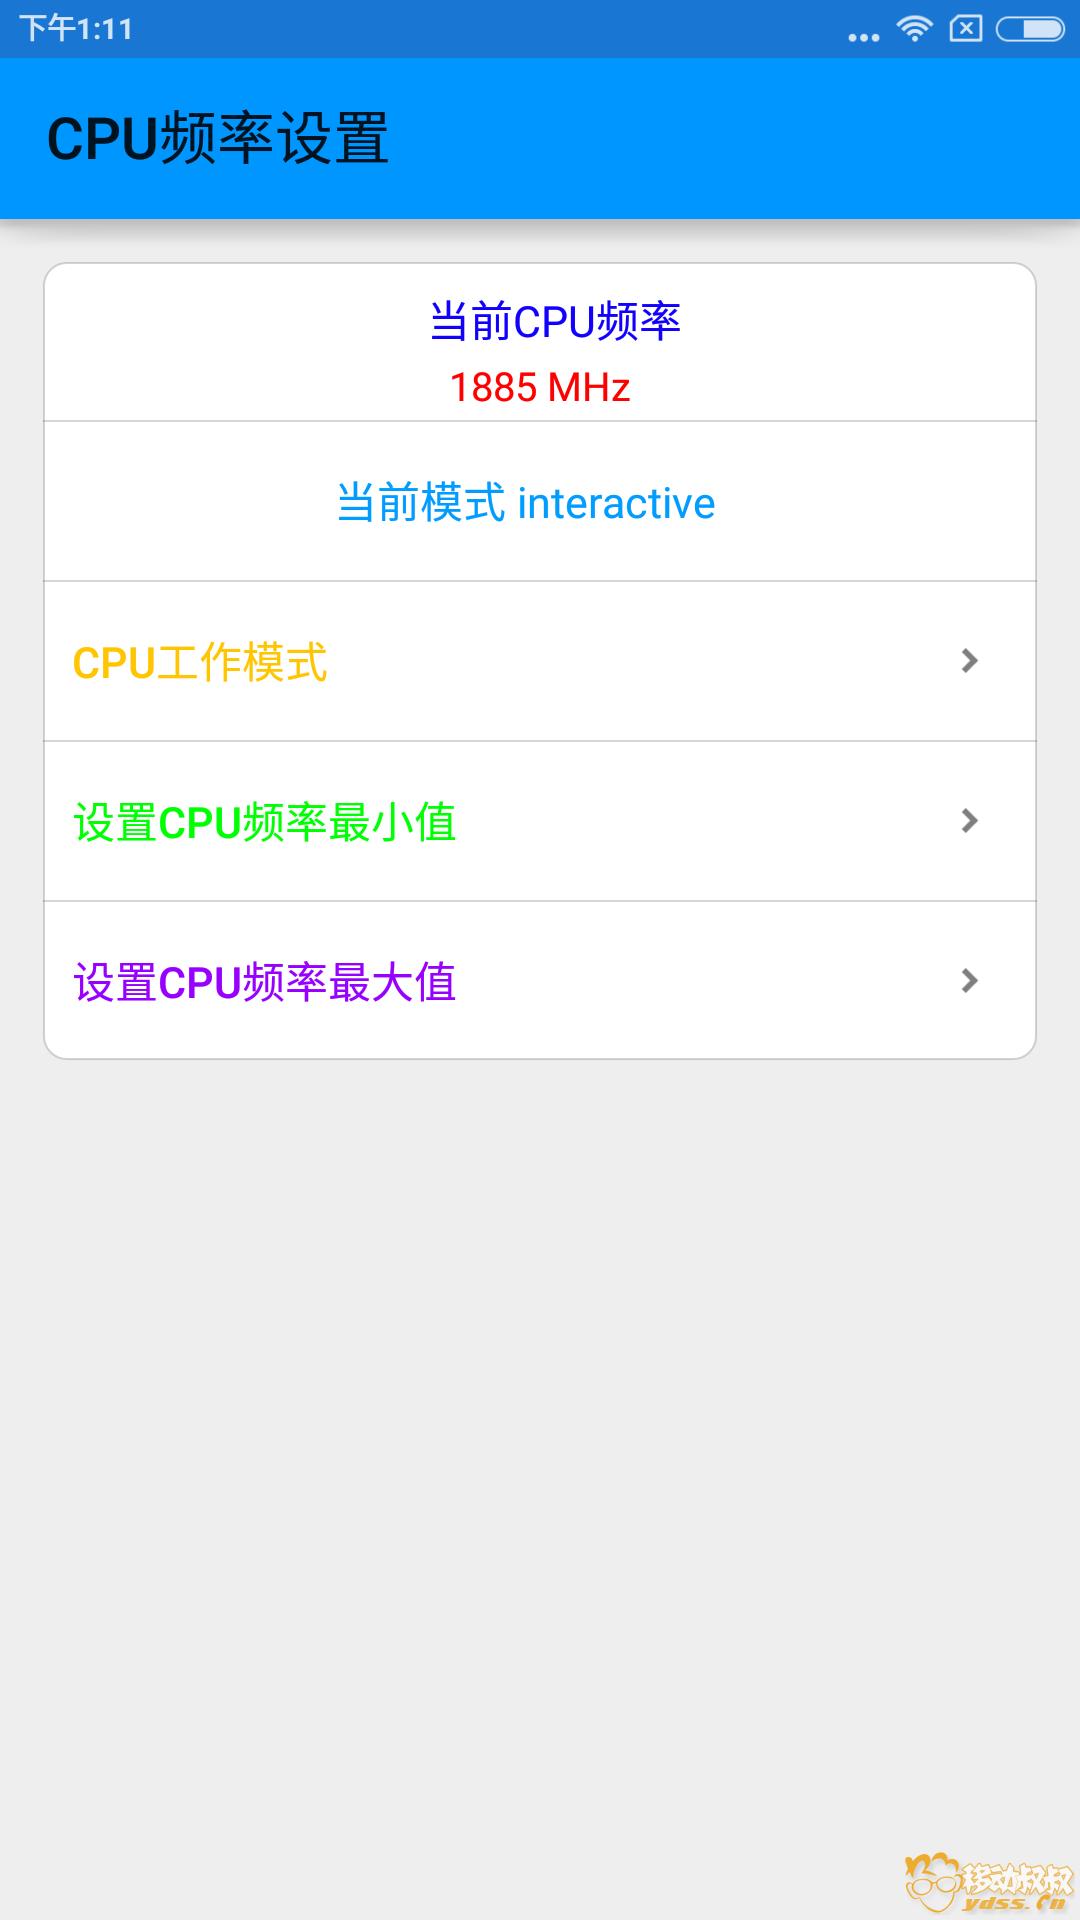 Screenshot_2017-11-29-13-11-04-029_com.zhanhong.tools.png